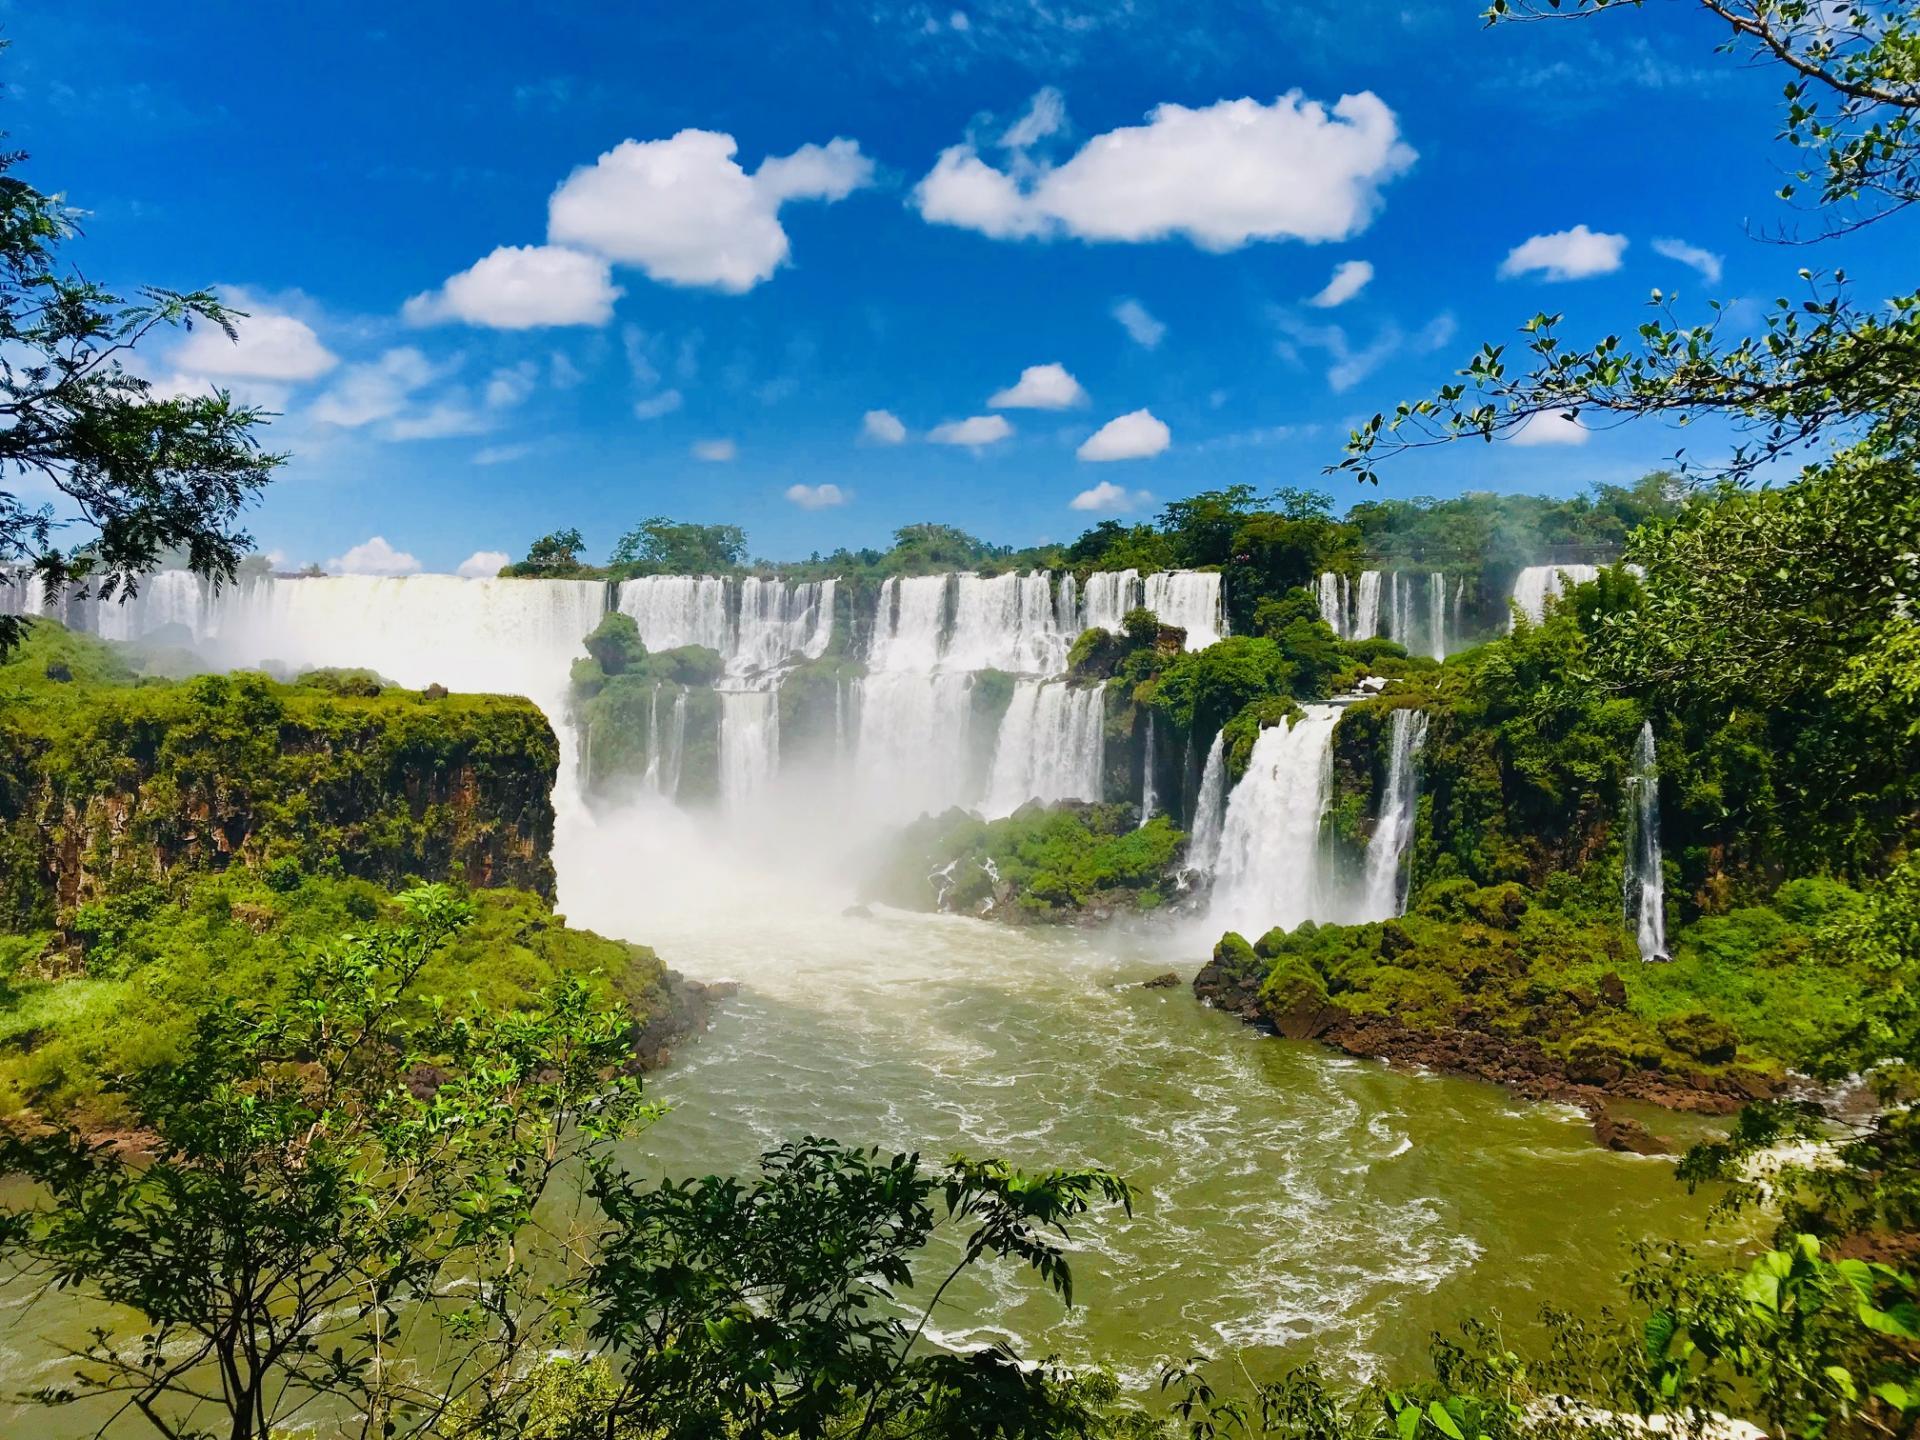 Les Chutes d'Iguazù